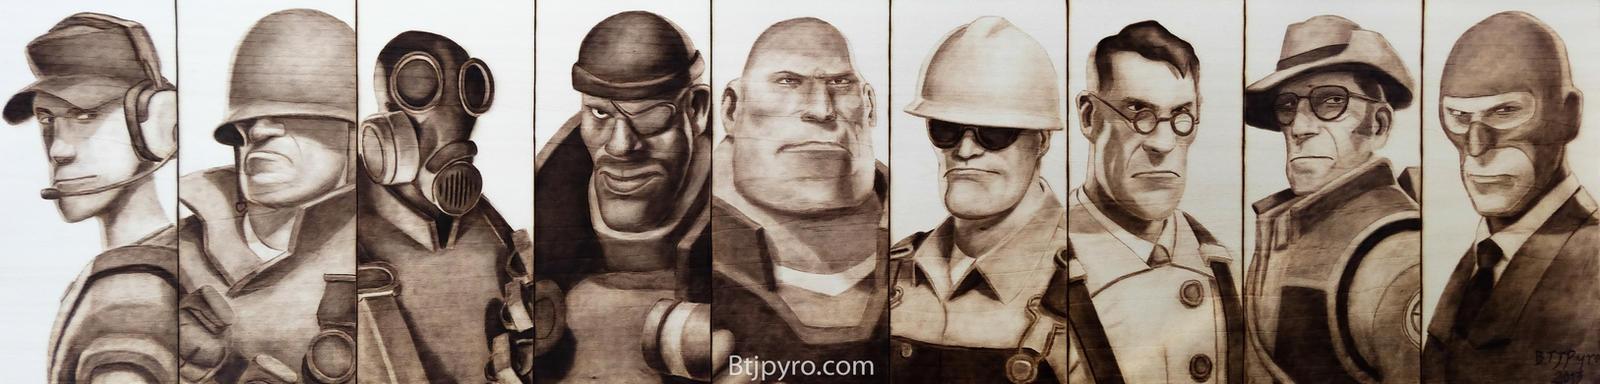 Team Fortress 2 - Class Portraits - Woodburning by brandojones